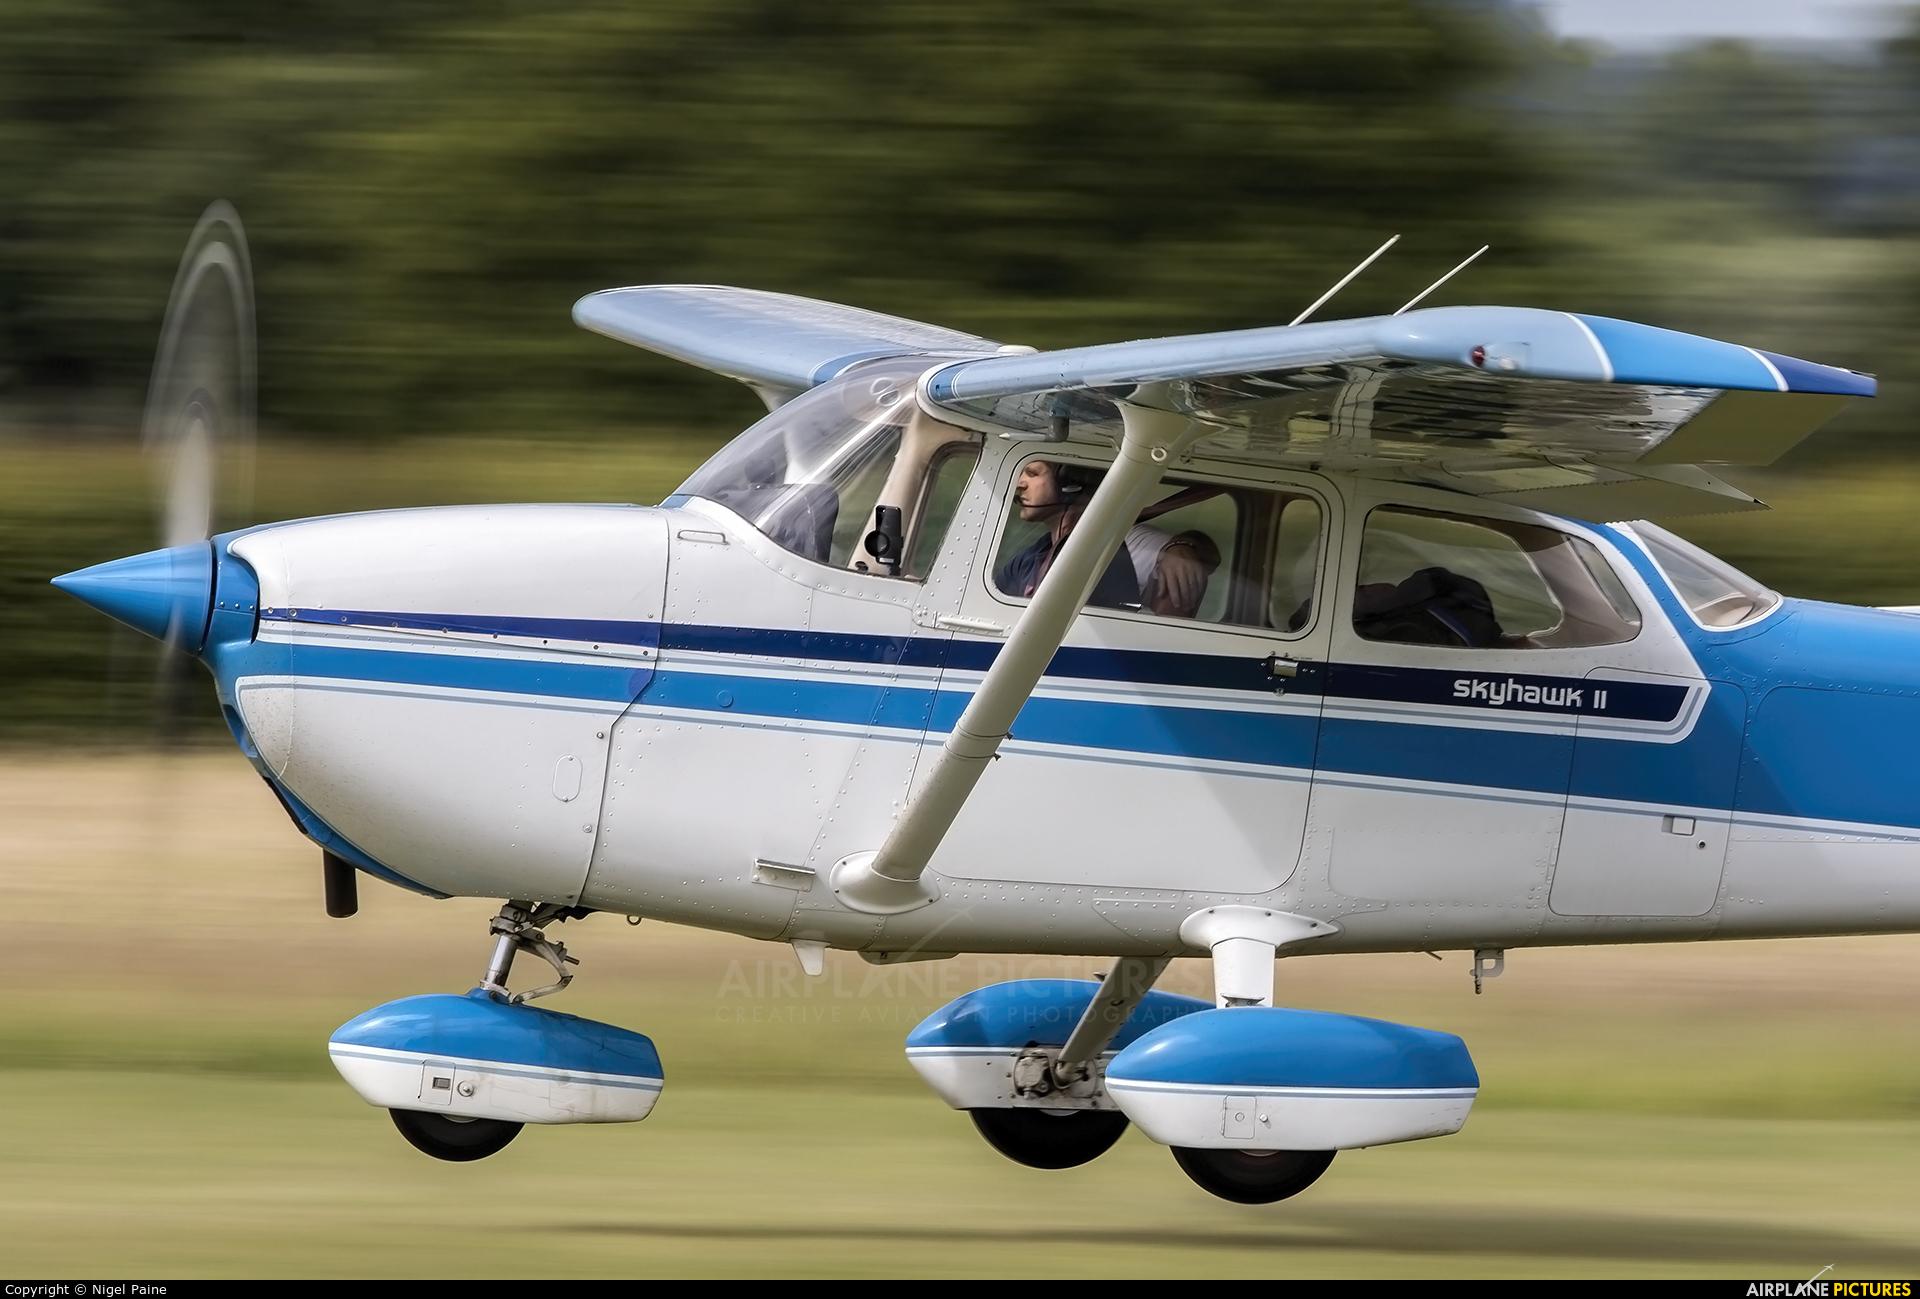 Private G-BKII aircraft at Lashenden / Headcorn